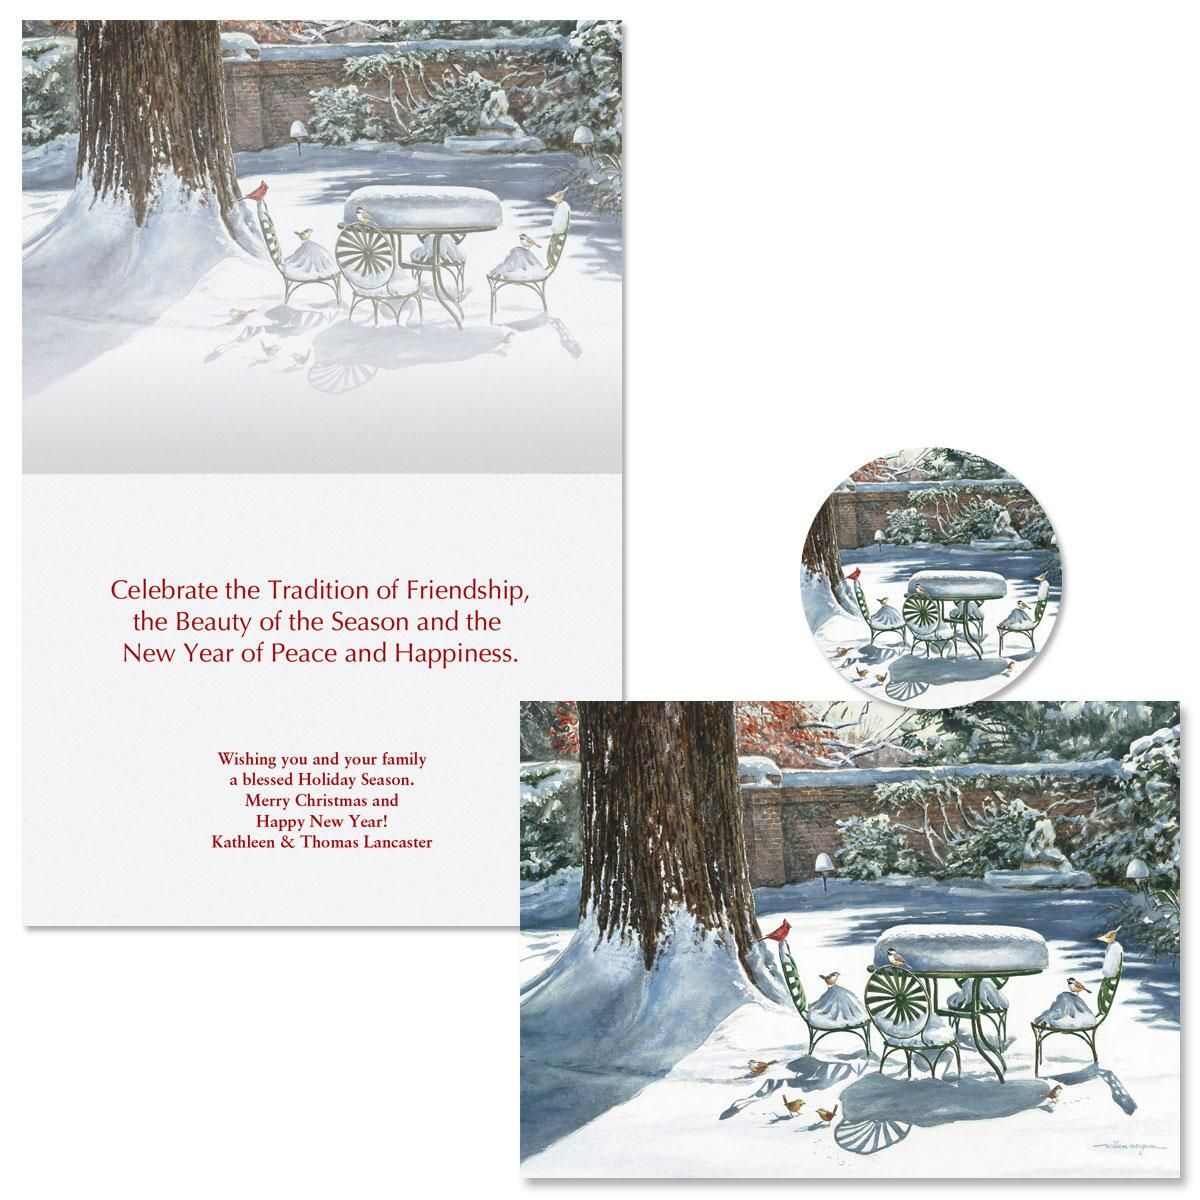 Garden Celebration Christmas Cards -  Personalized